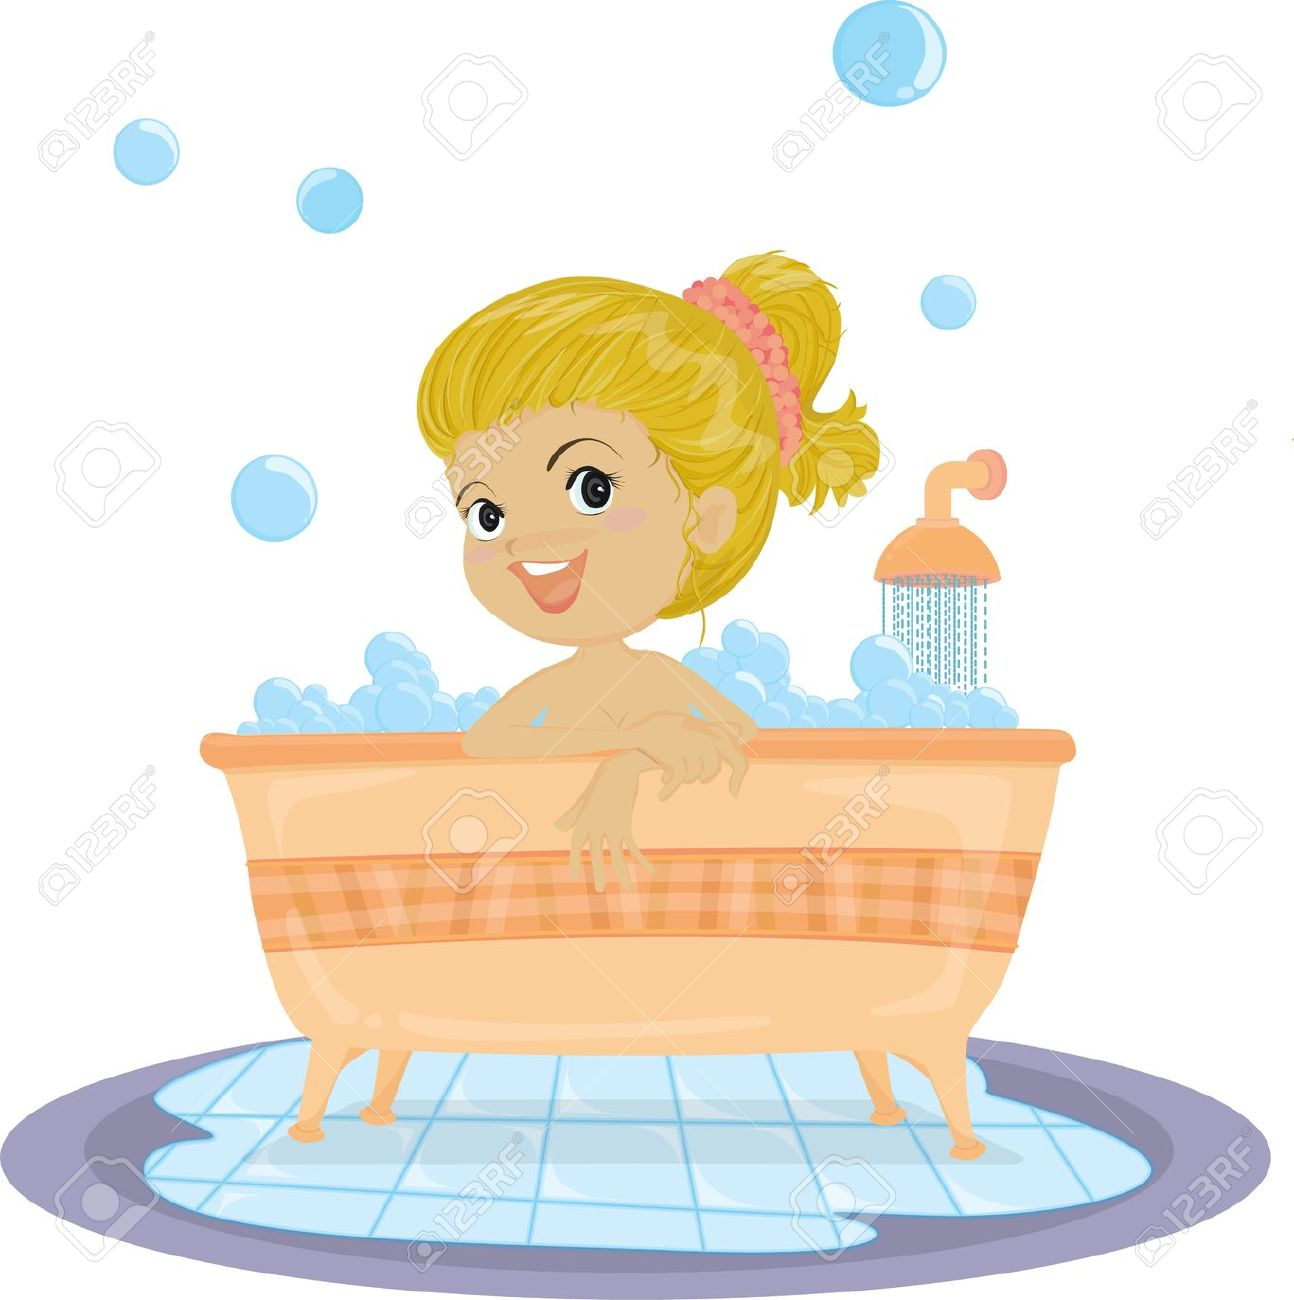 Bath clipart illustration. Having a